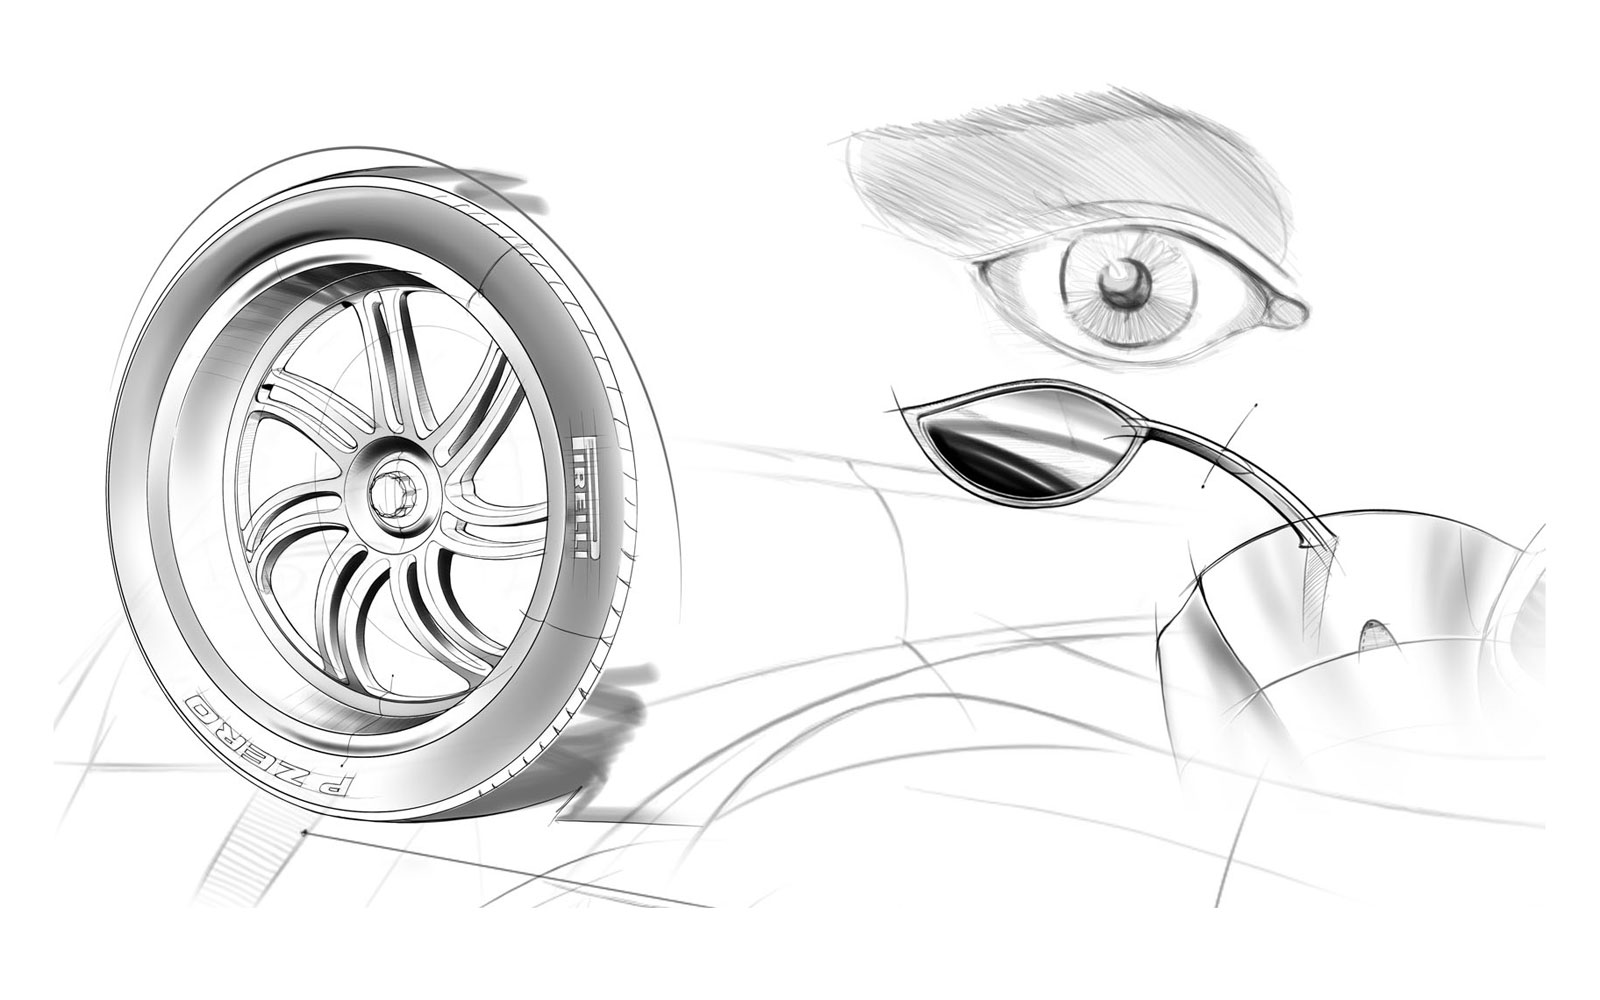 Pagani Huayra Design Sketch - Car Design